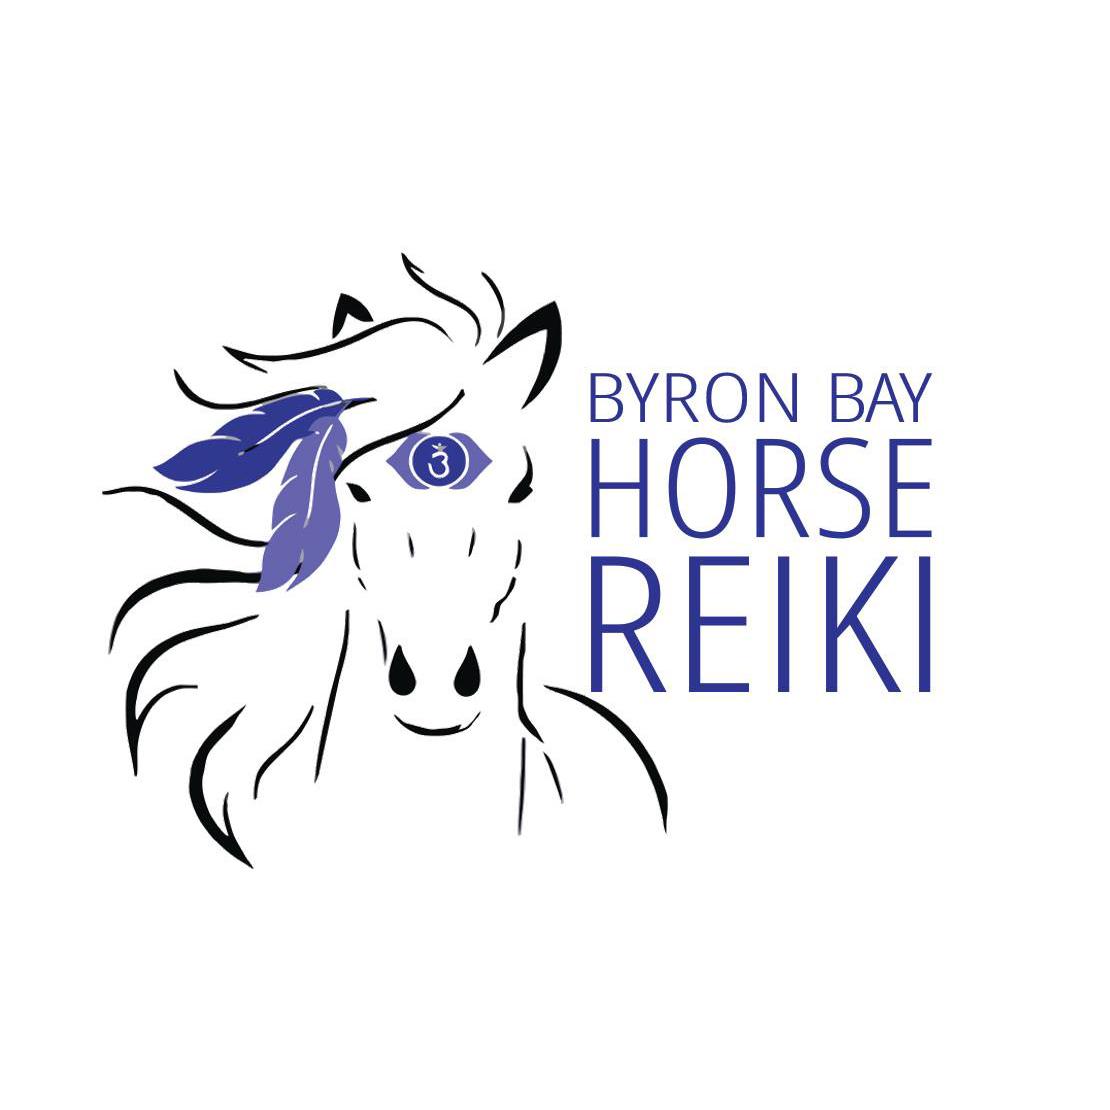 Byron Bay Horse Reiki